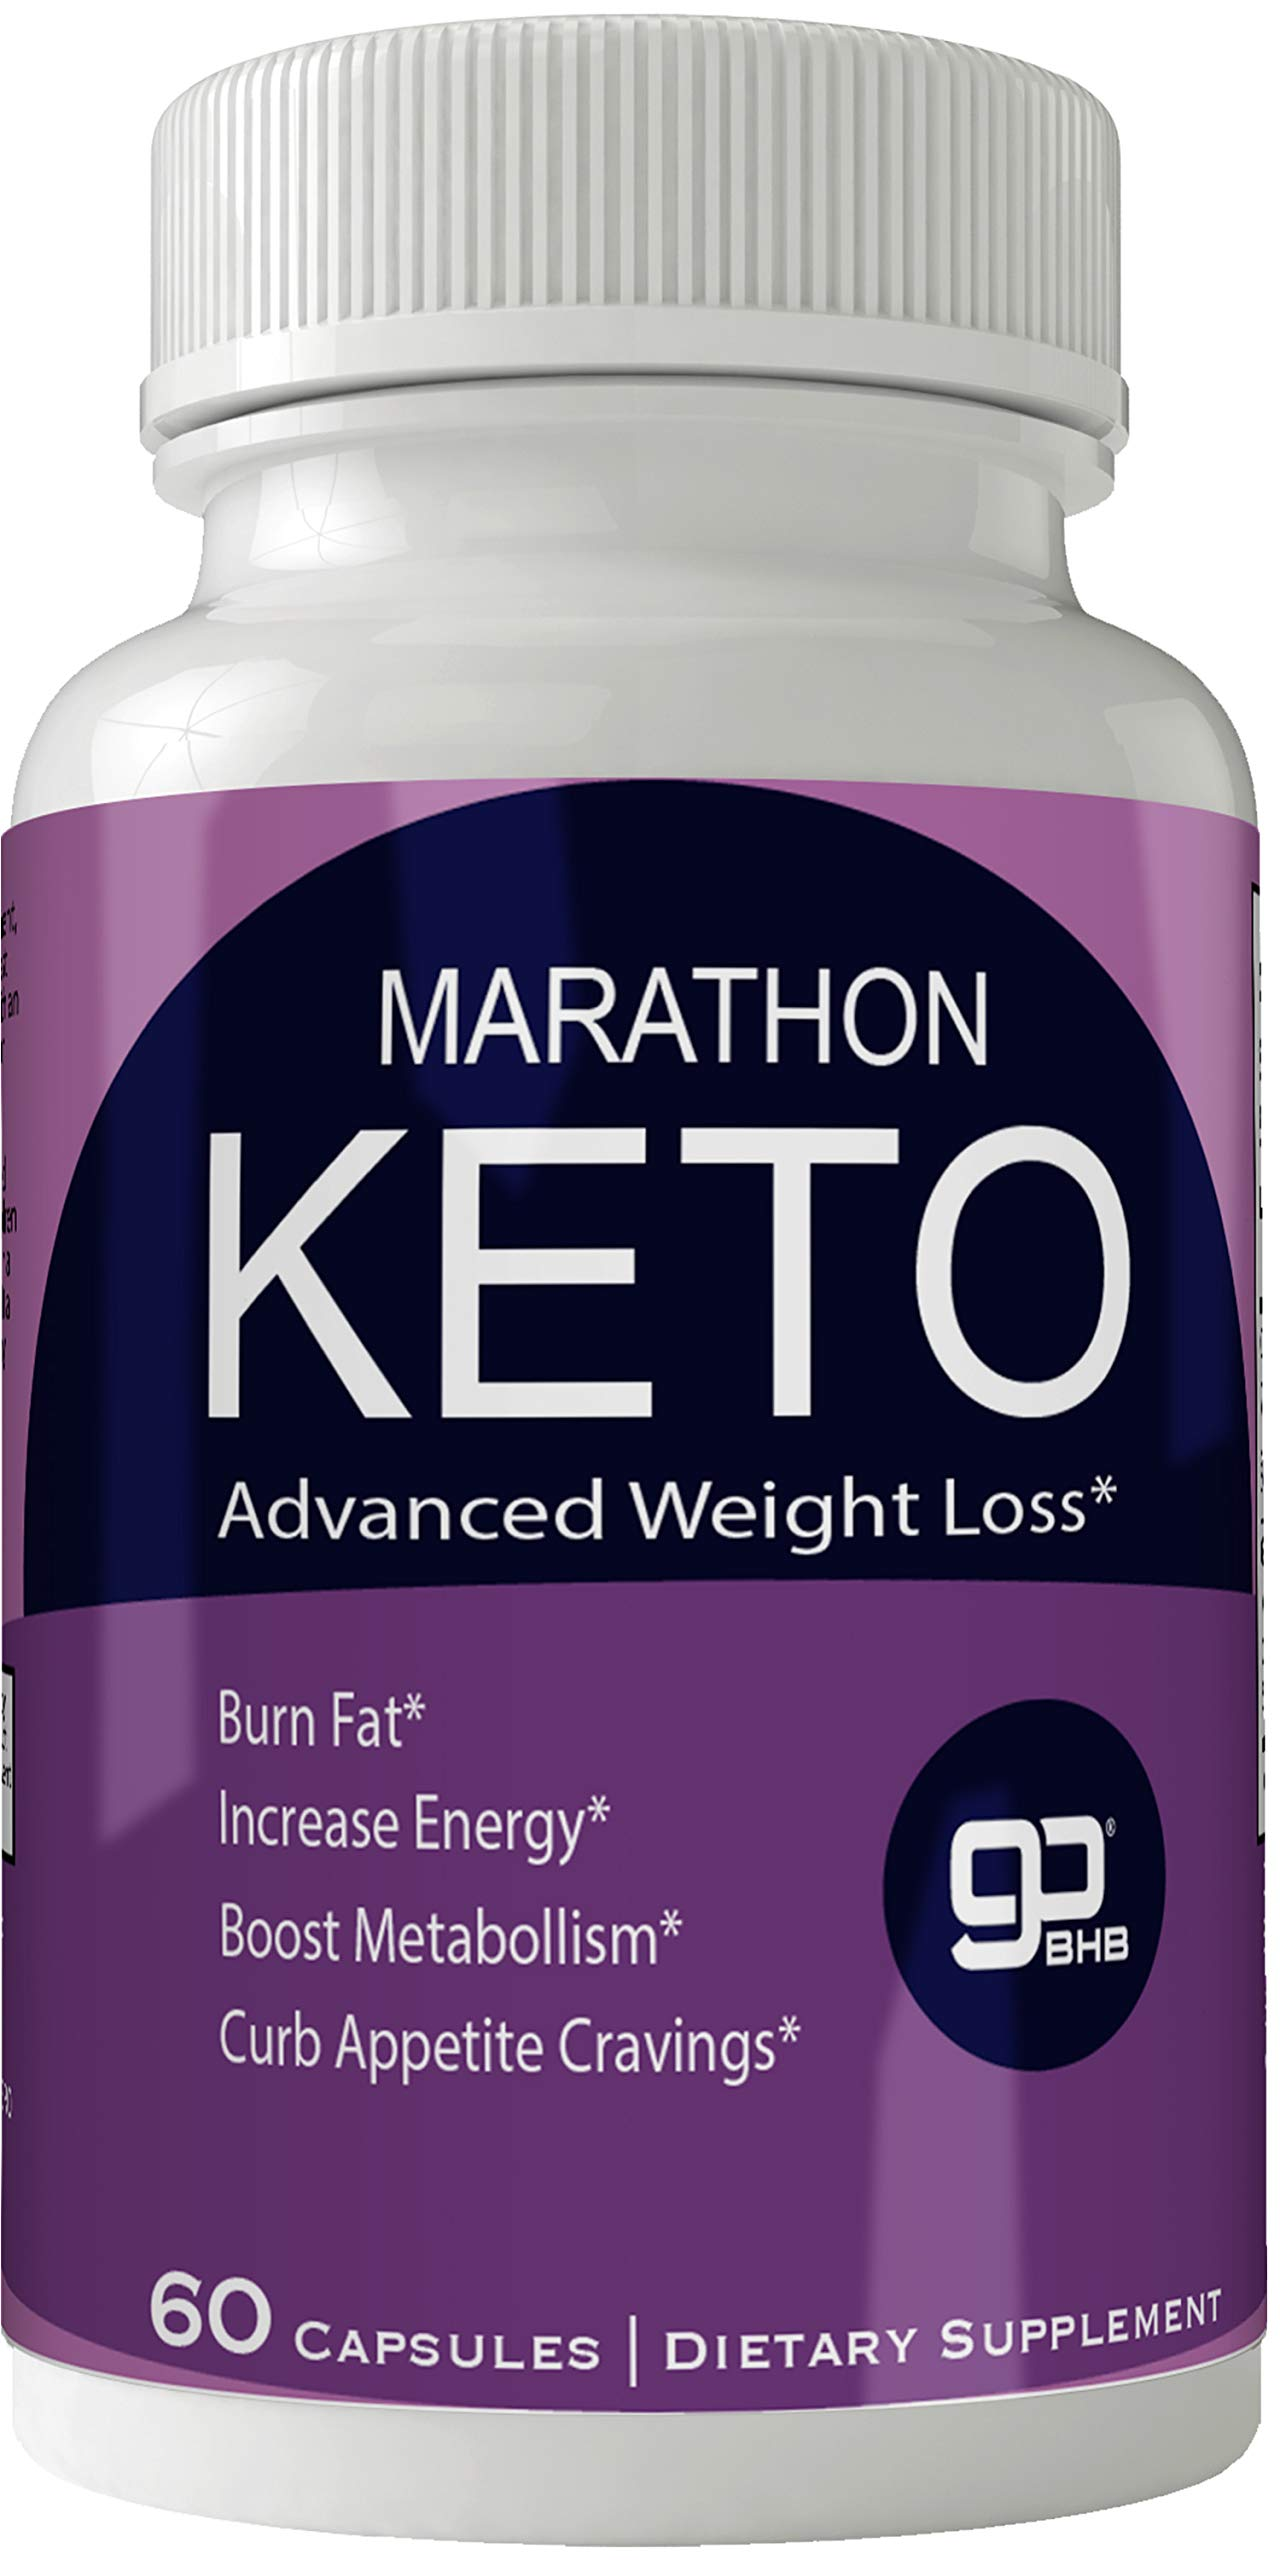 Marathon Keto Advanced Natural Ketogenic Weight Loss Pills for Women and Men, BHB Burn Fat Supplement, 800 mg Formula with New True Slim GO BHB Salts Formula, Advanced Appetite Suppressant Capsules